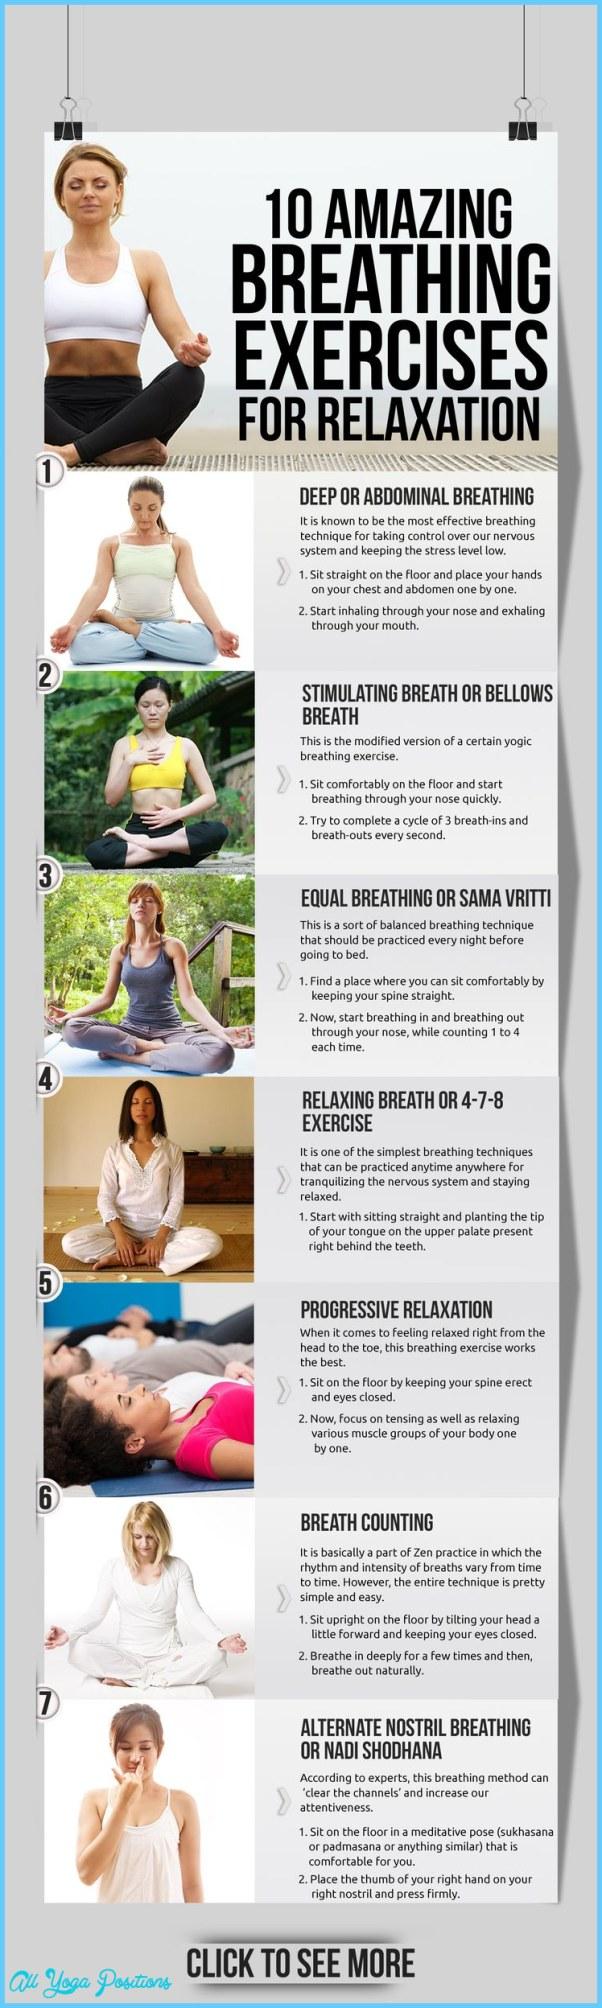 Yoga Breathing For Anxiety_13.jpg